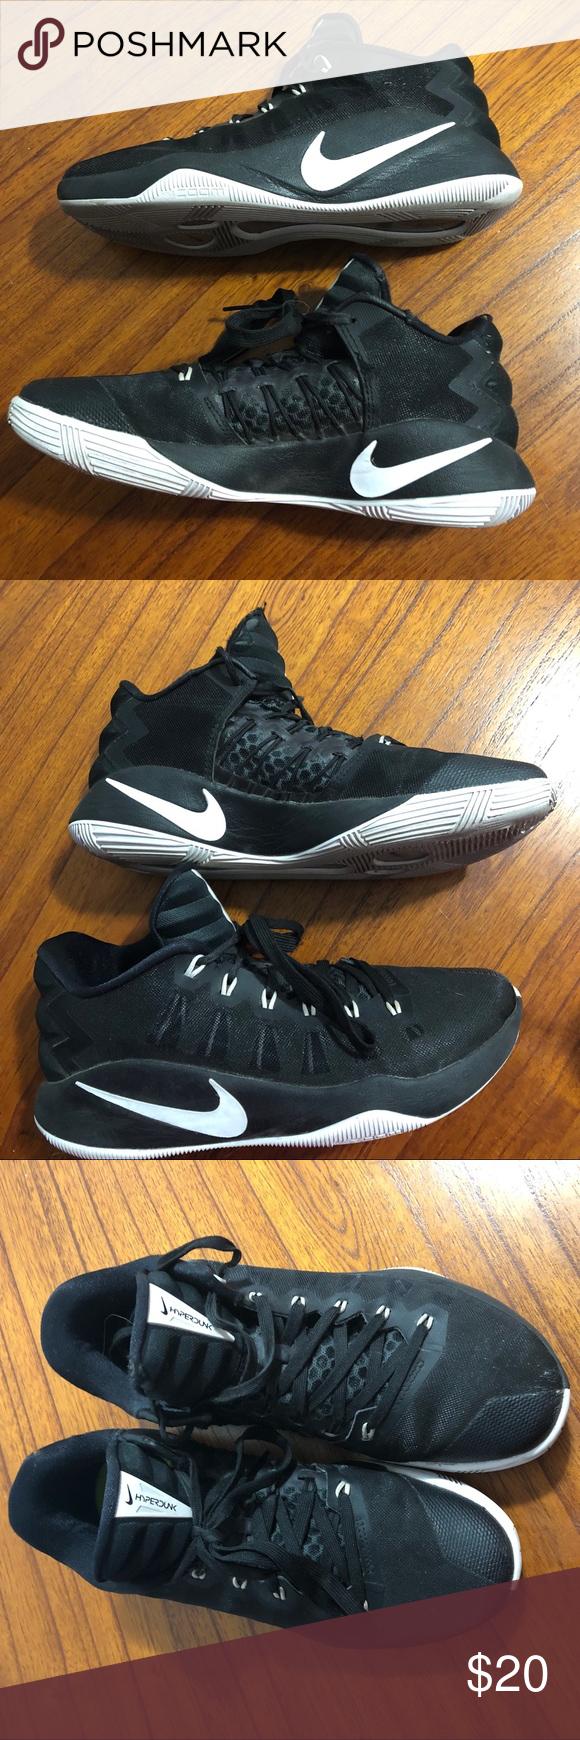 Nike Zoom Hyperdunk 2016 Low Basketball Shoes Nike Zoom Basketball Shoes Black Nikes